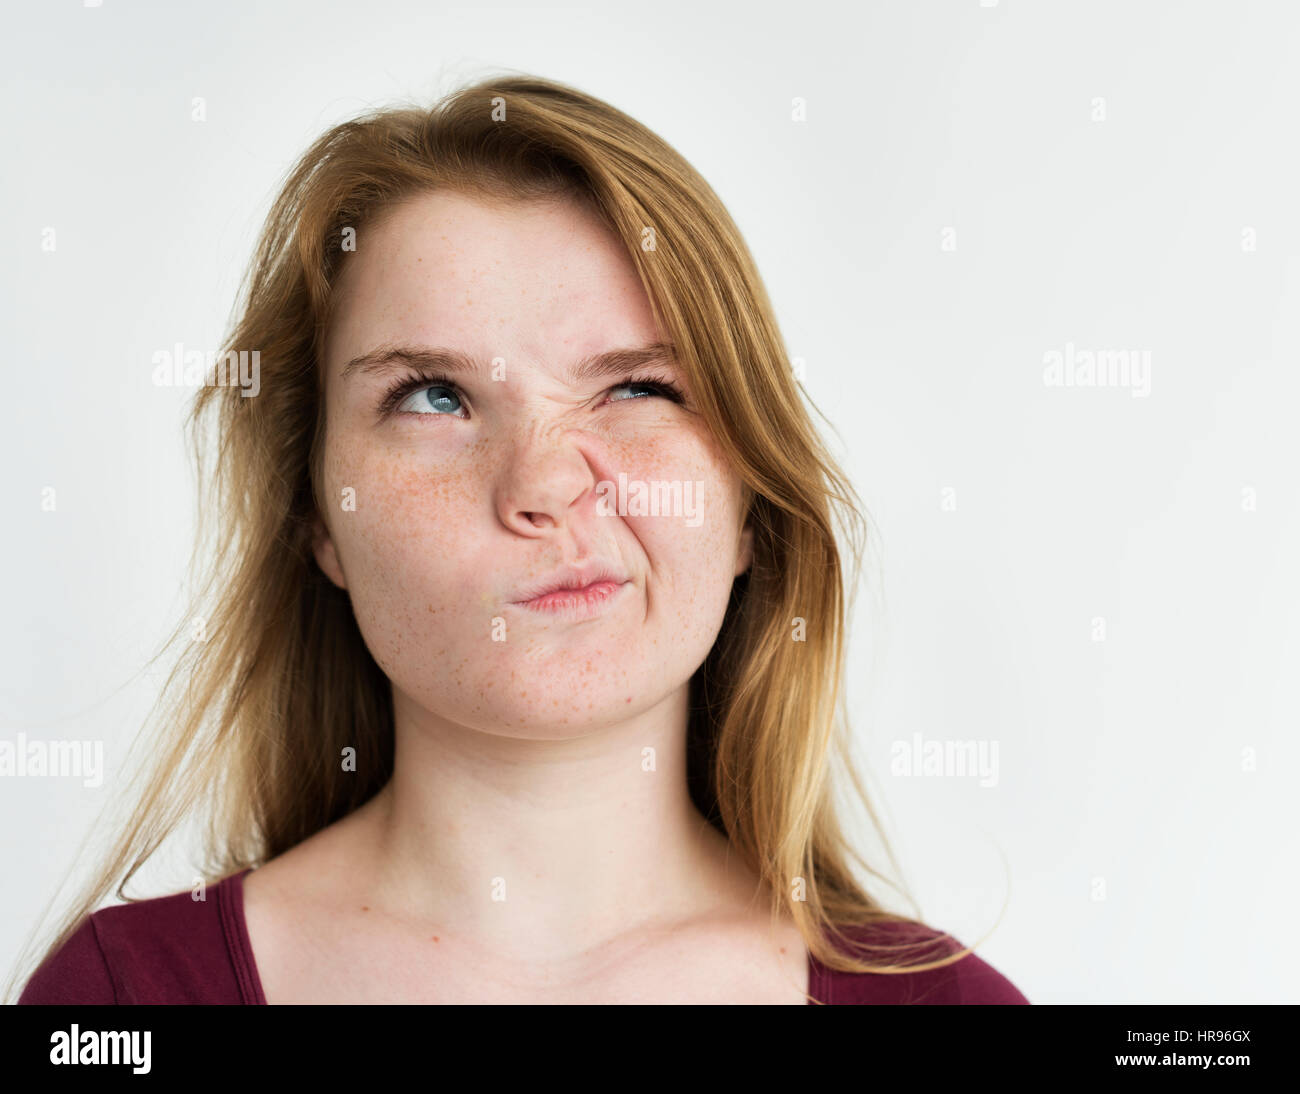 girl annoyed face expression portrait stock photo 134812410 alamy